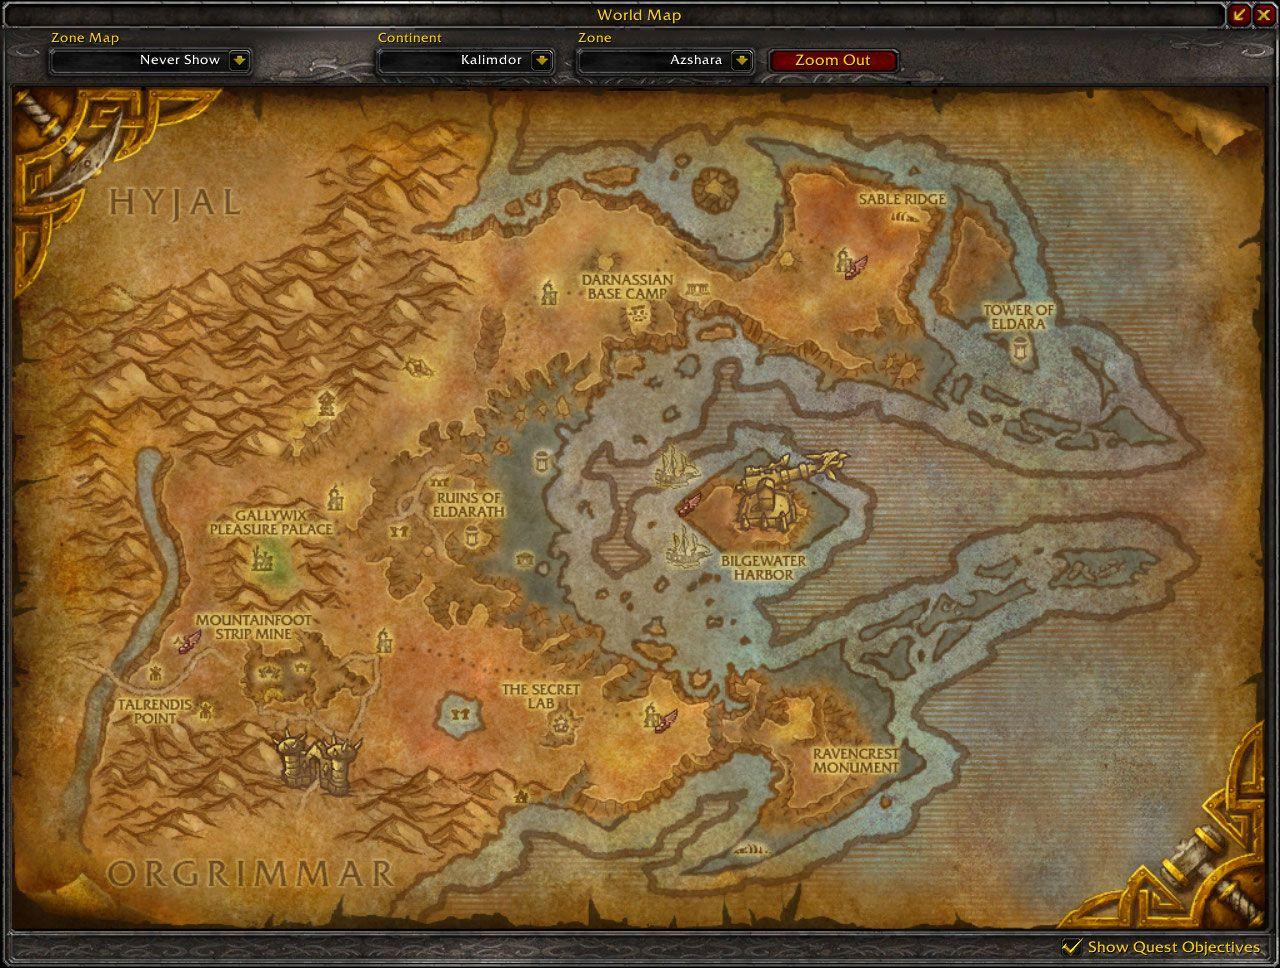 Azshara Cataclysm map wow screenshot - Gamingcfg.com